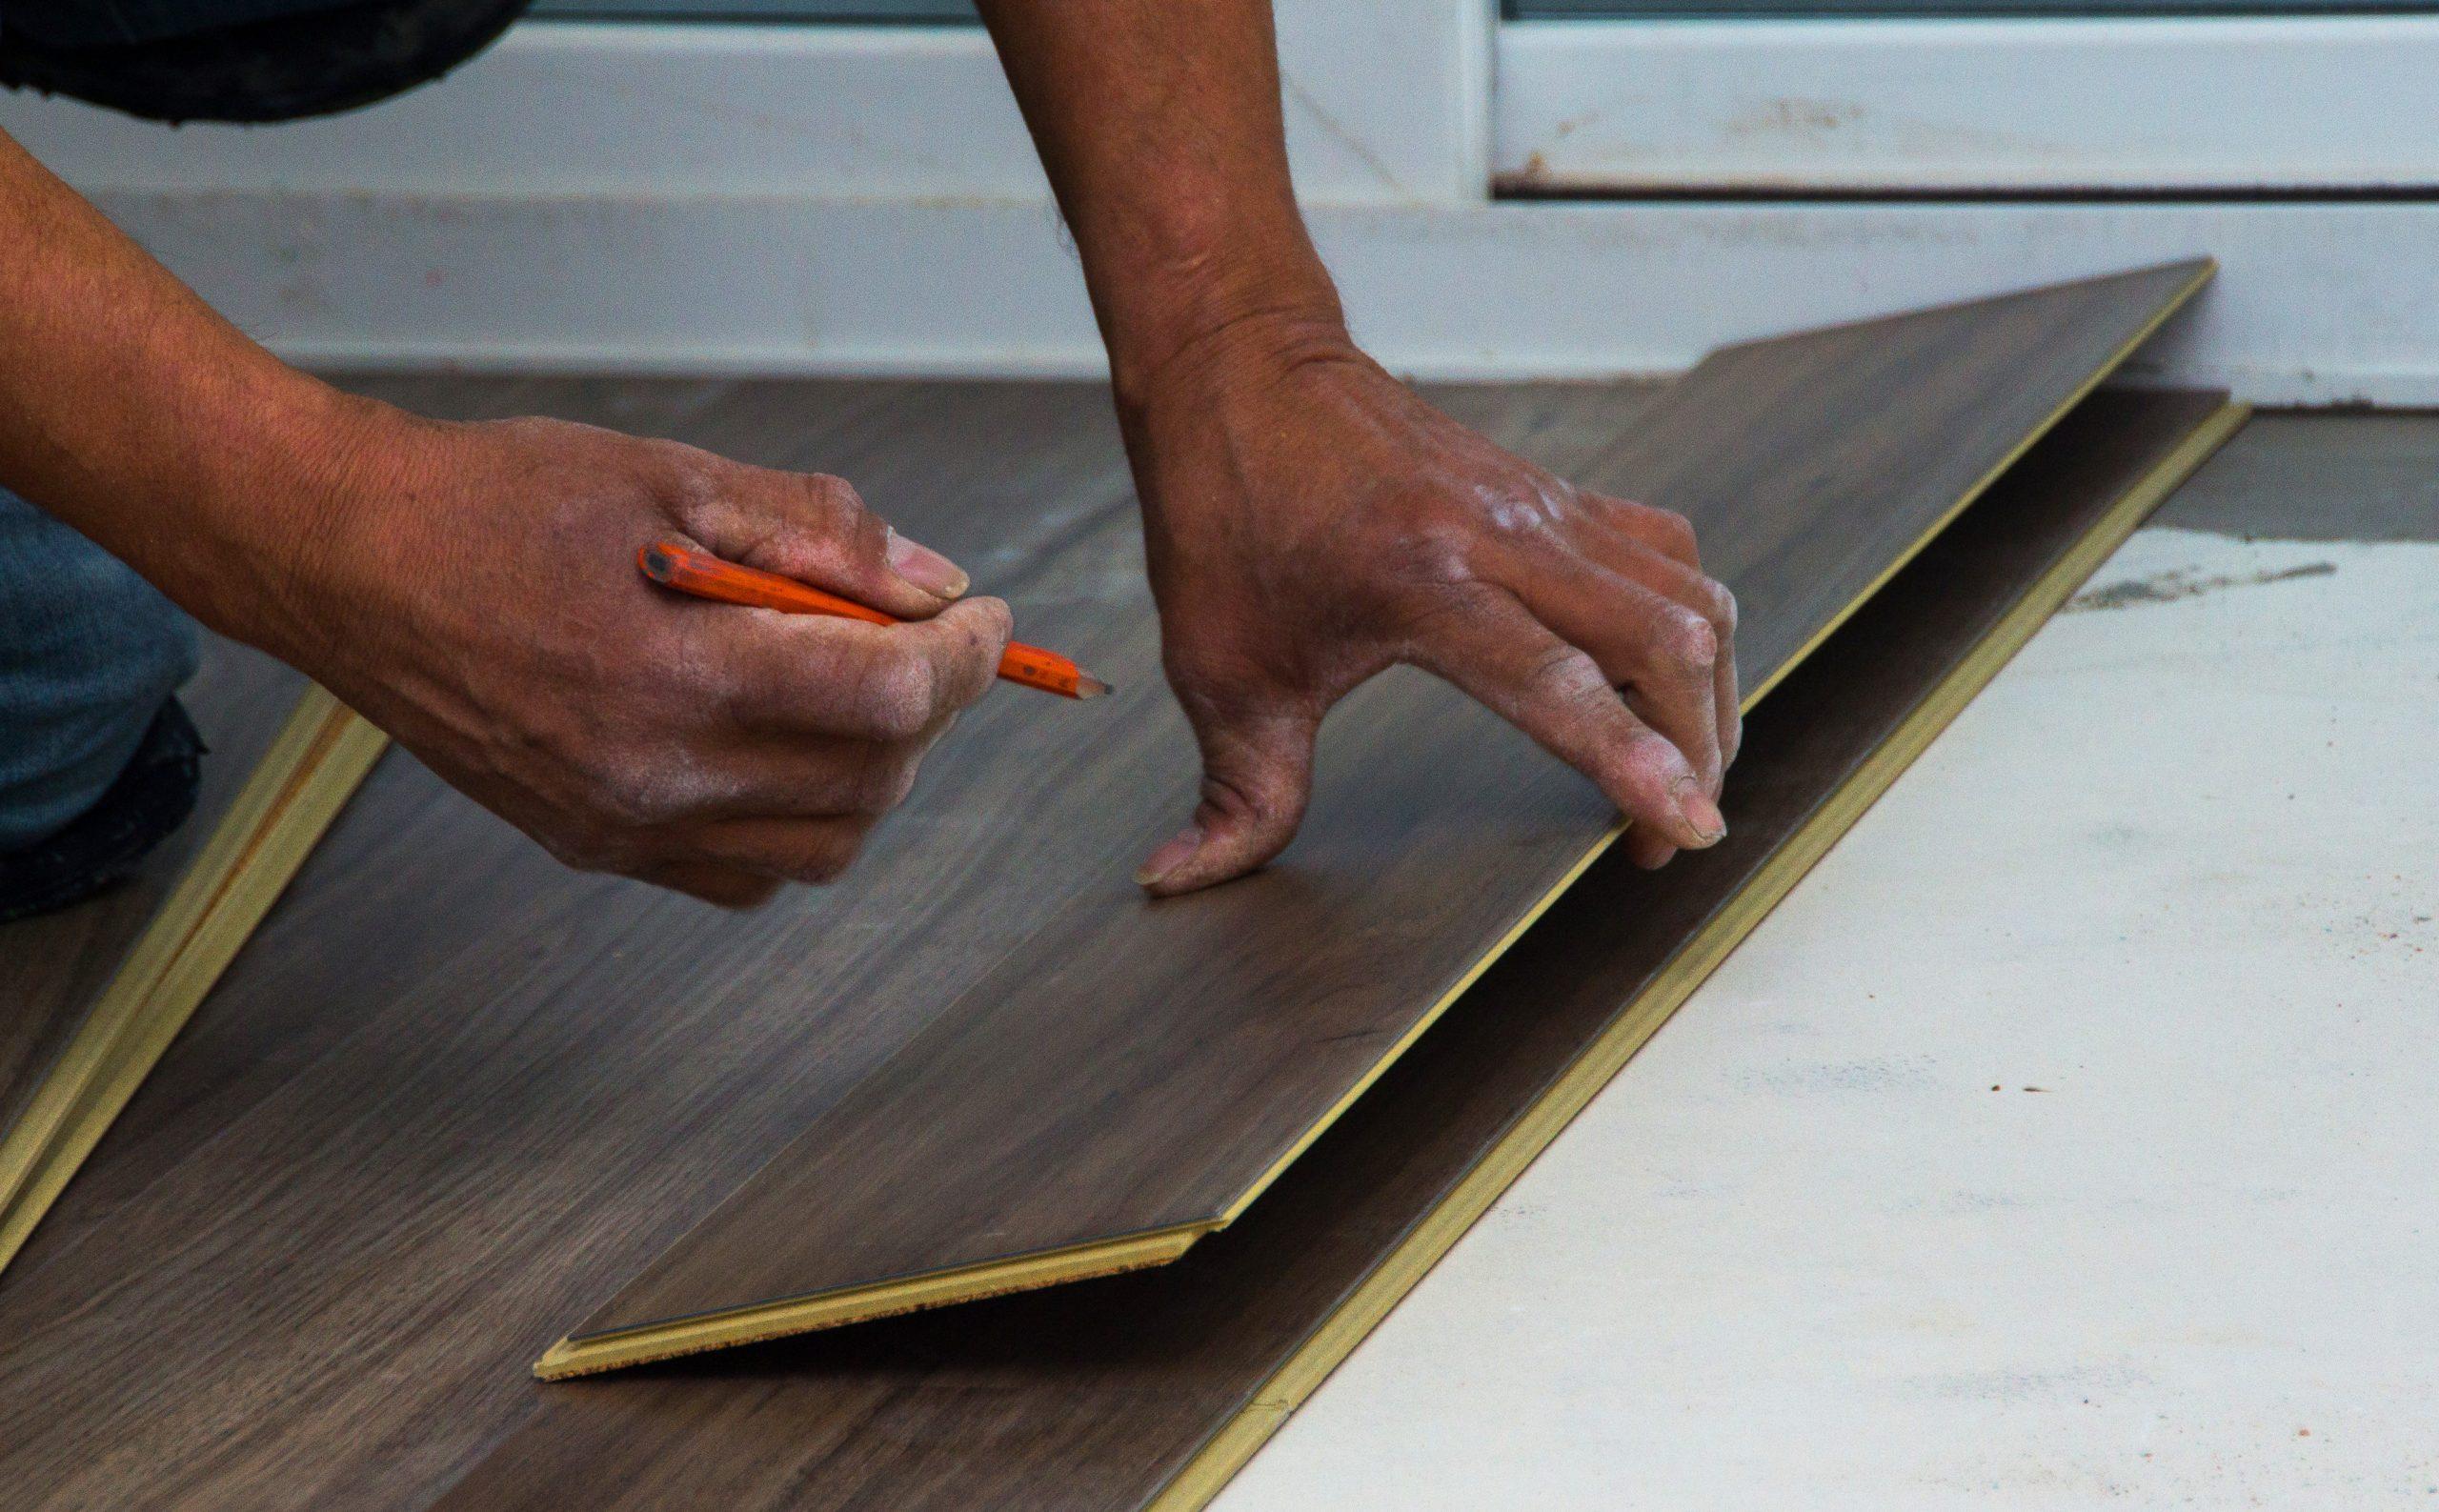 luxury vinyl flooring from Direct Flooring - flooring contractor in Flemington, NJ